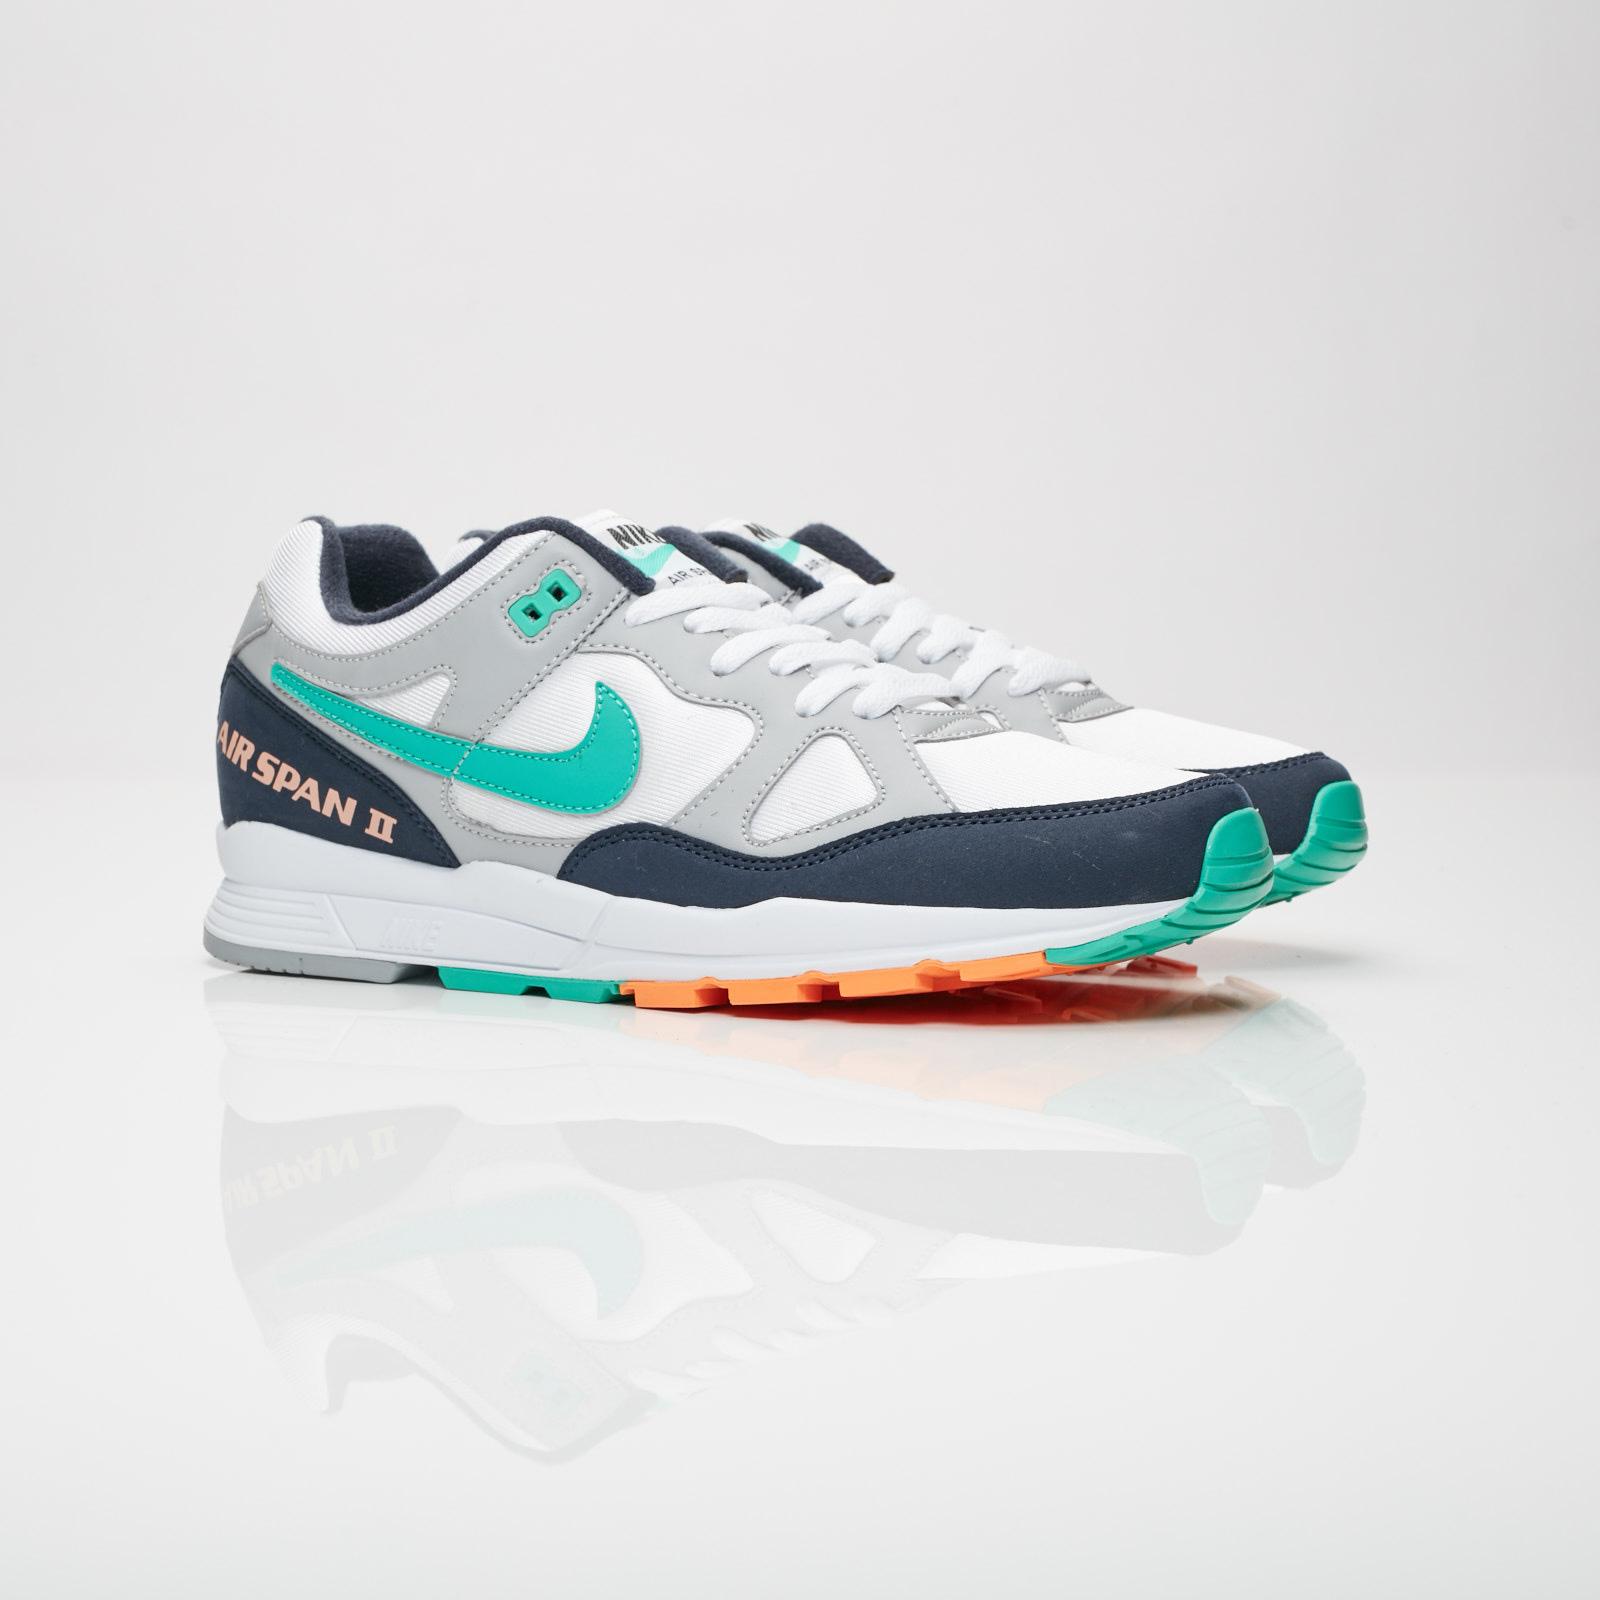 best service 2bb8a f055a Nike Sportswear Air Span II